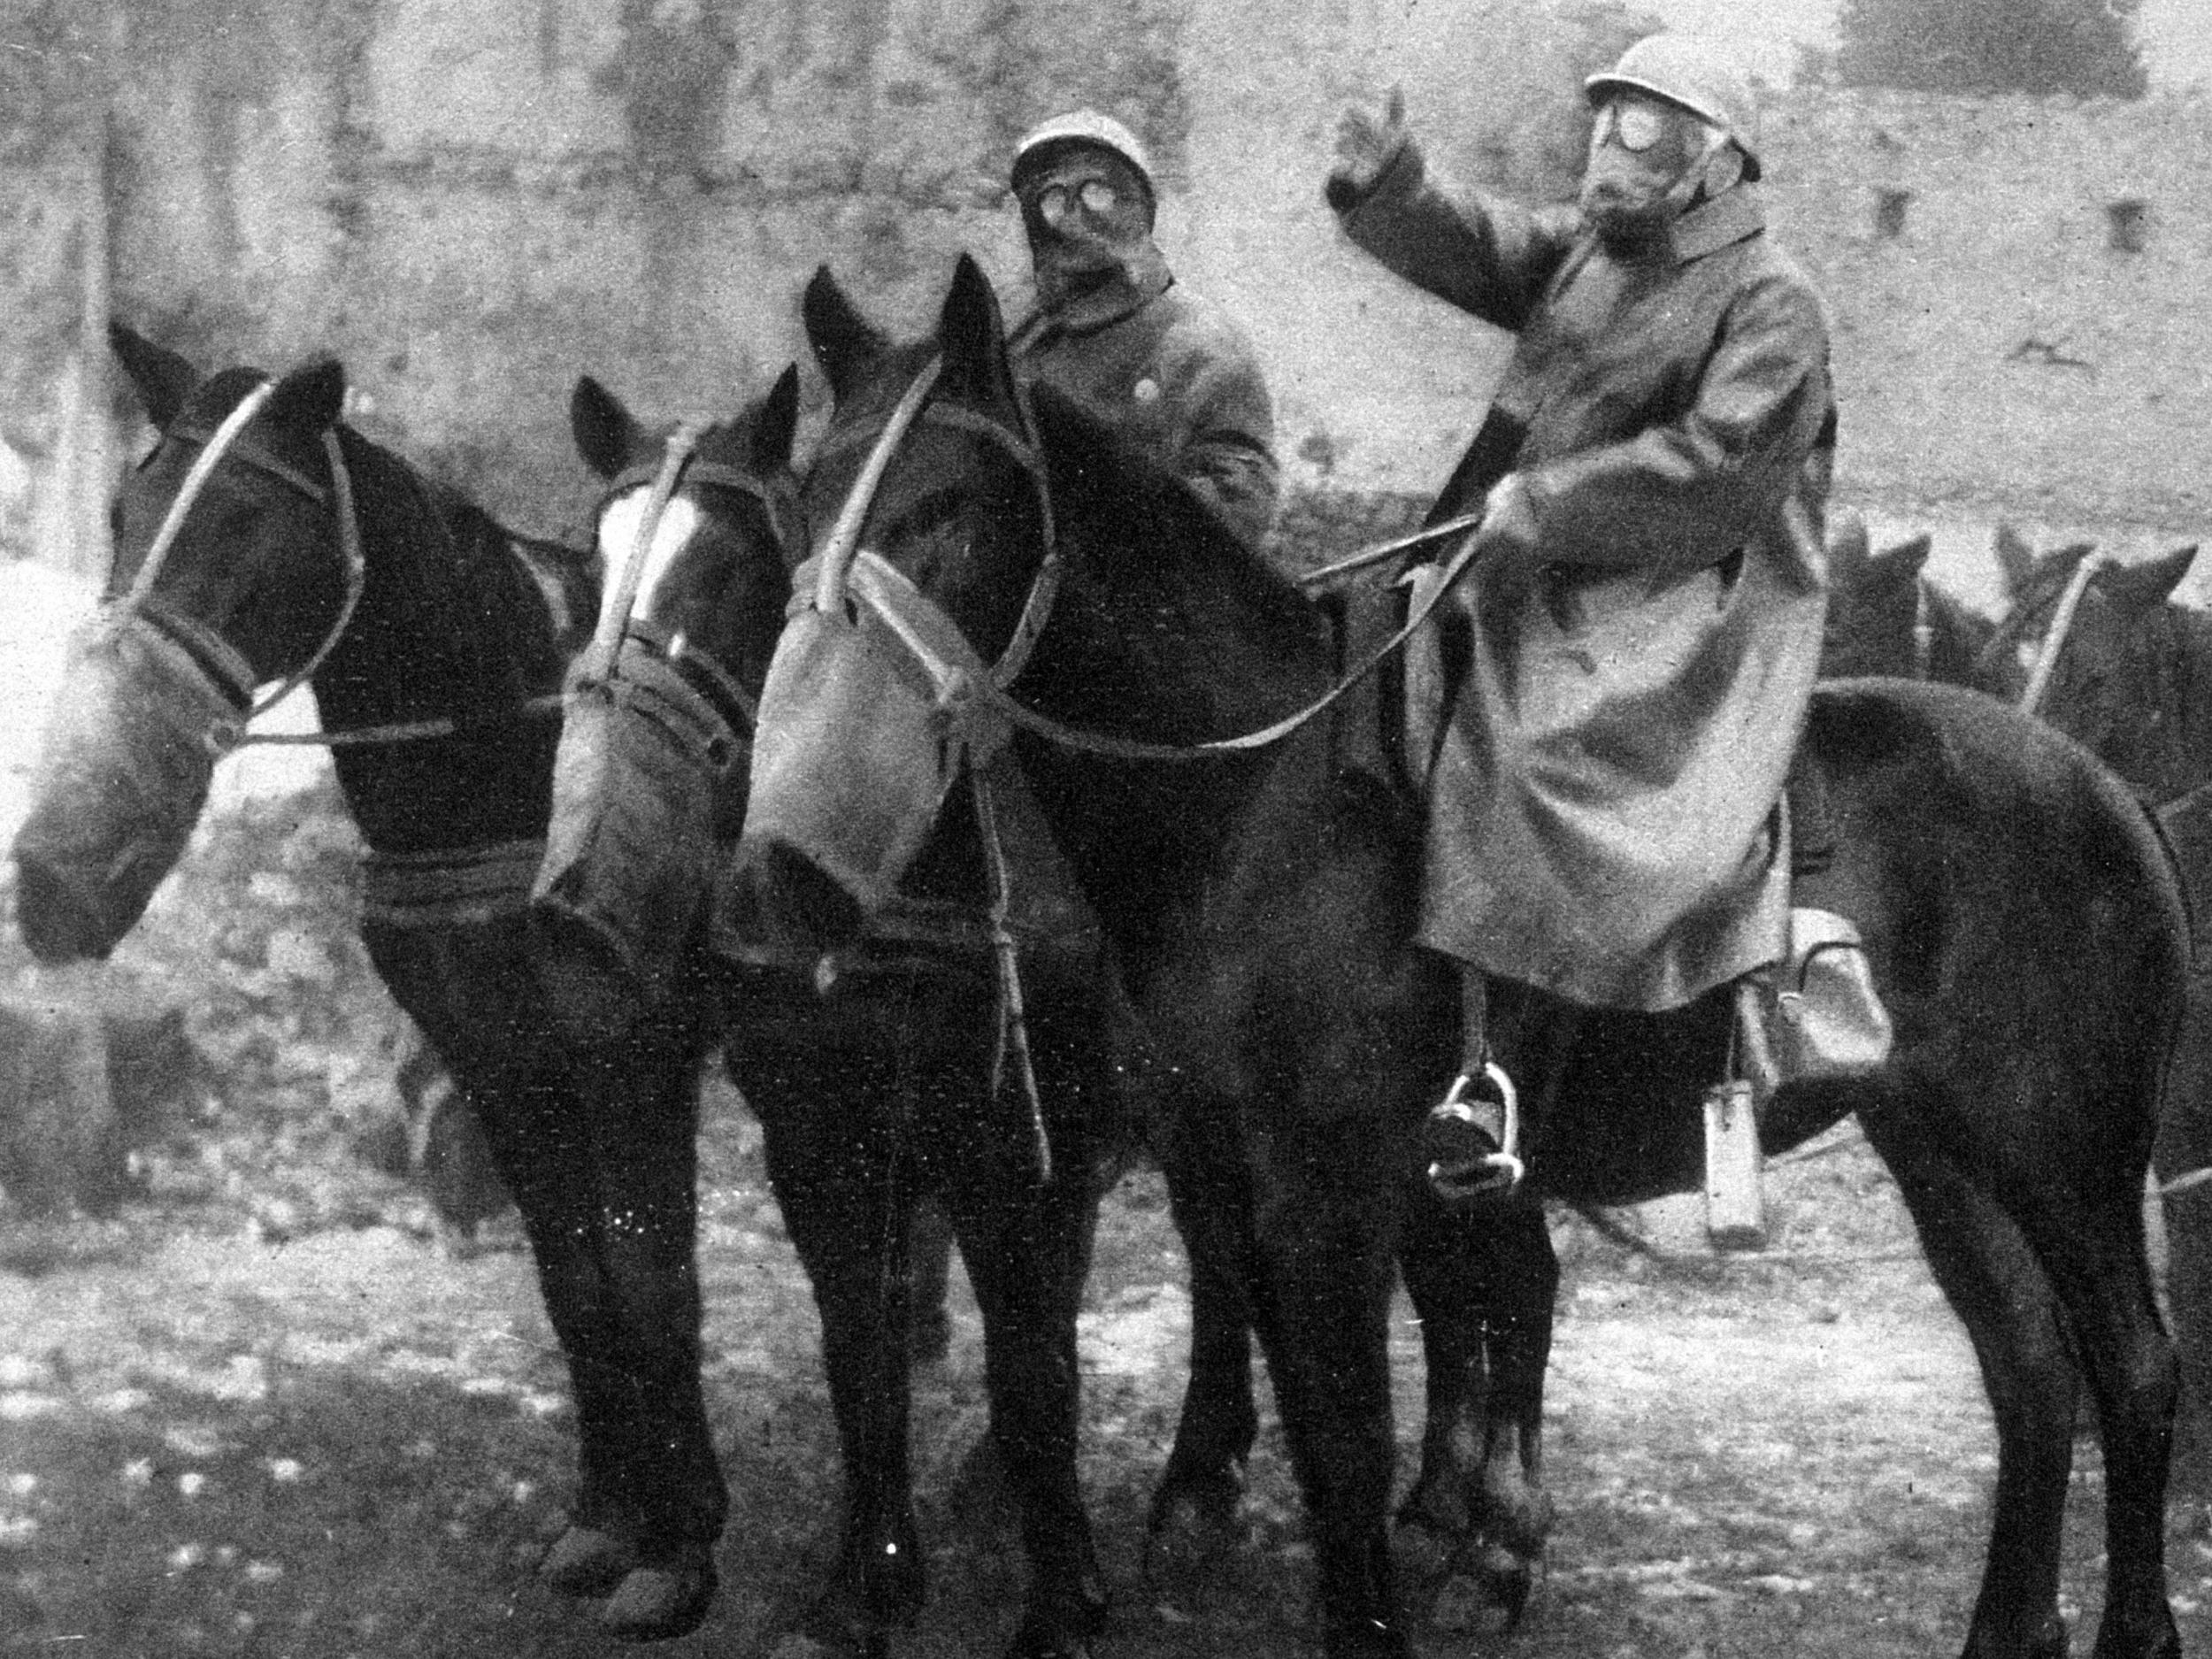 87b1ef0116de2 New statue honours heroic horses of First World War